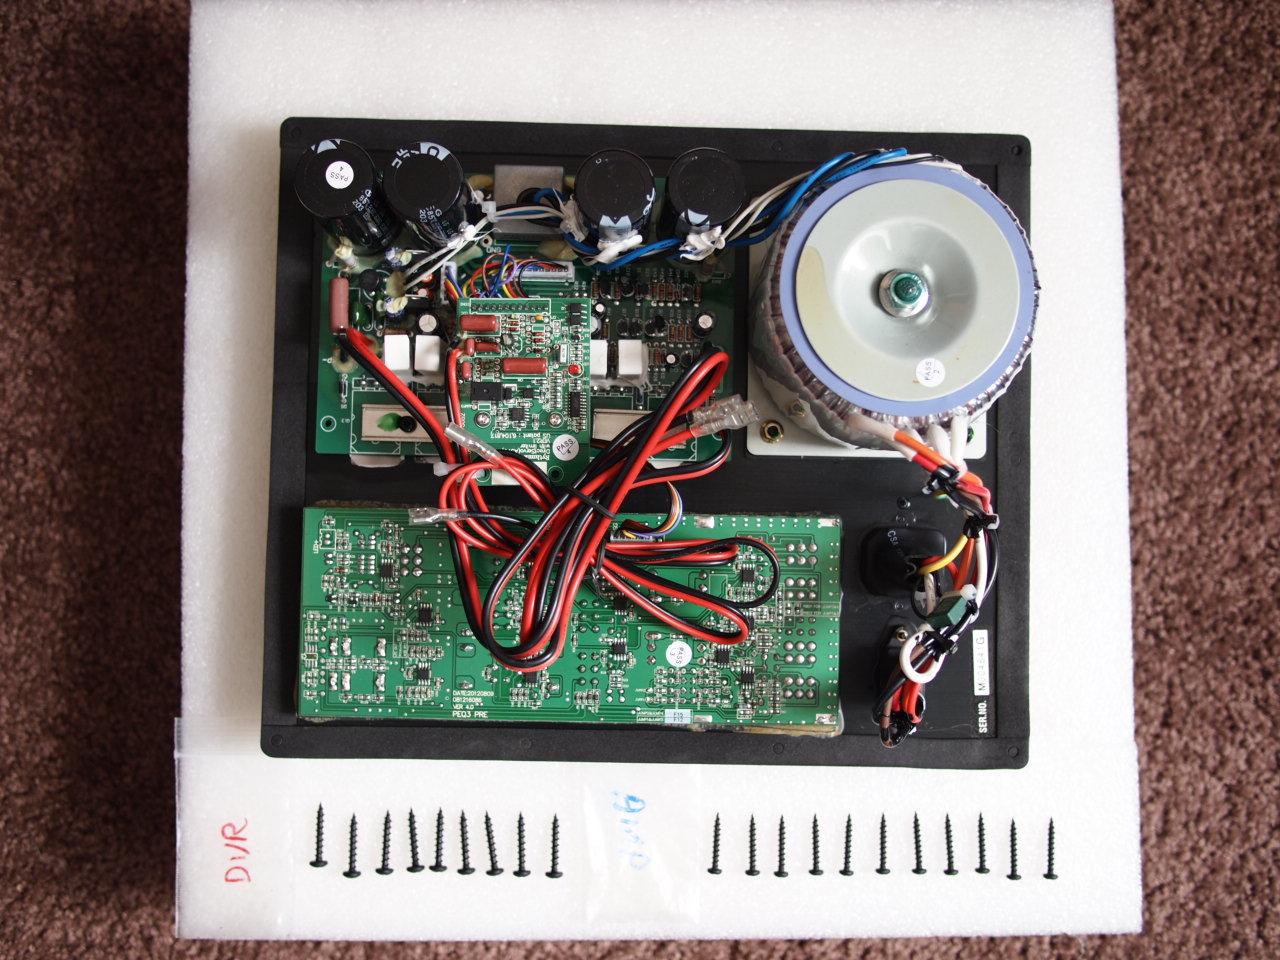 Rythmik Audio Xlr Connector Wiring Diagram Http Wwwdvxusercom V6 Showthreadphp Fotkideporu Photo 613059 48711yttv8ji6z3 Bfmmvet4rt 873146